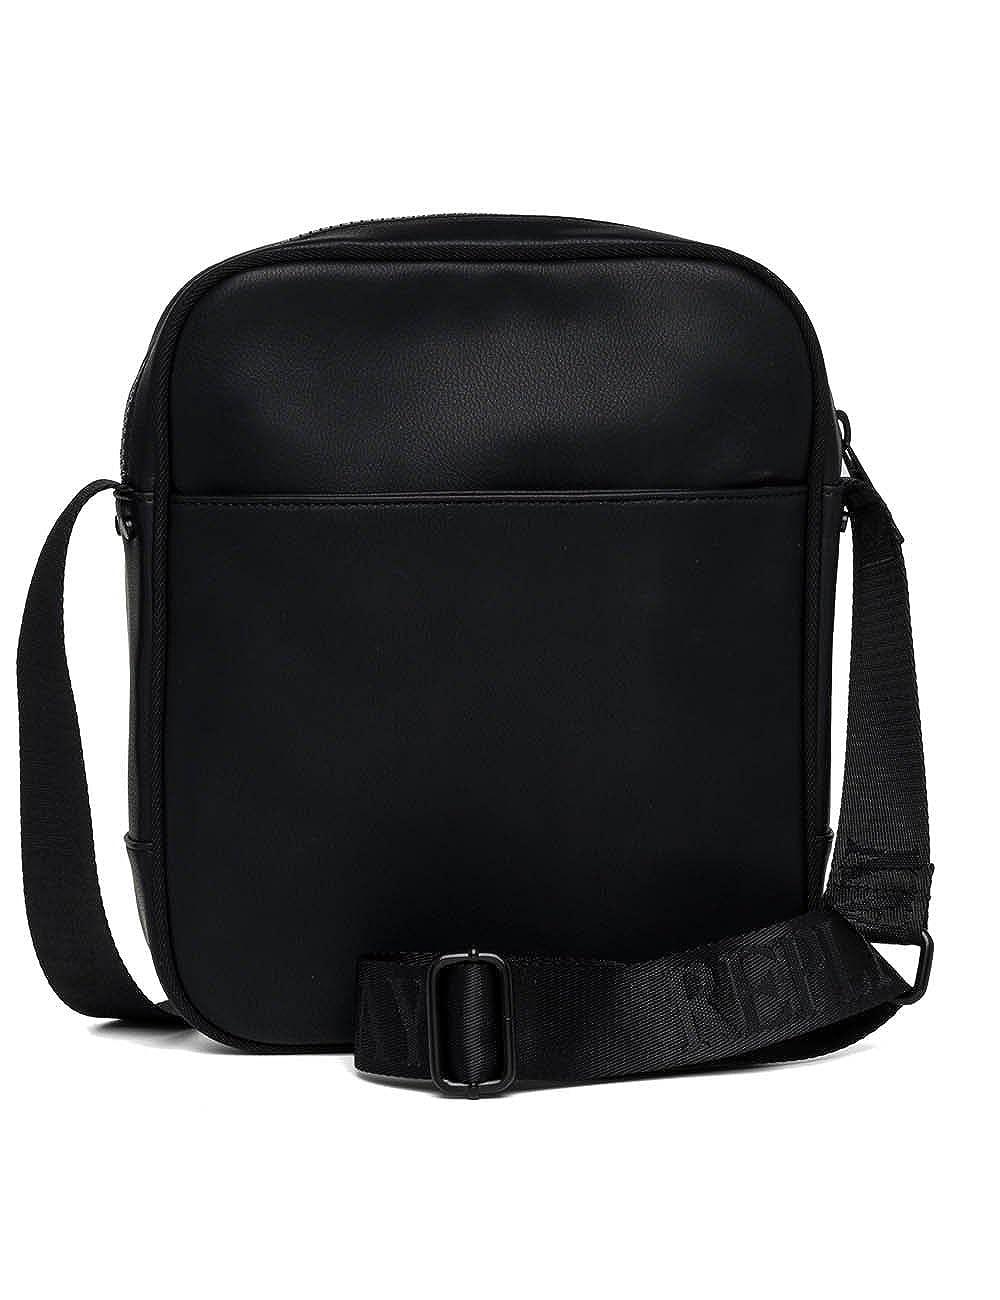 1b4f8c044f4e Replay Men s Men s Eco-Leather Black Cross-Body Bag Black  Amazon.ca  Shoes    Handbags